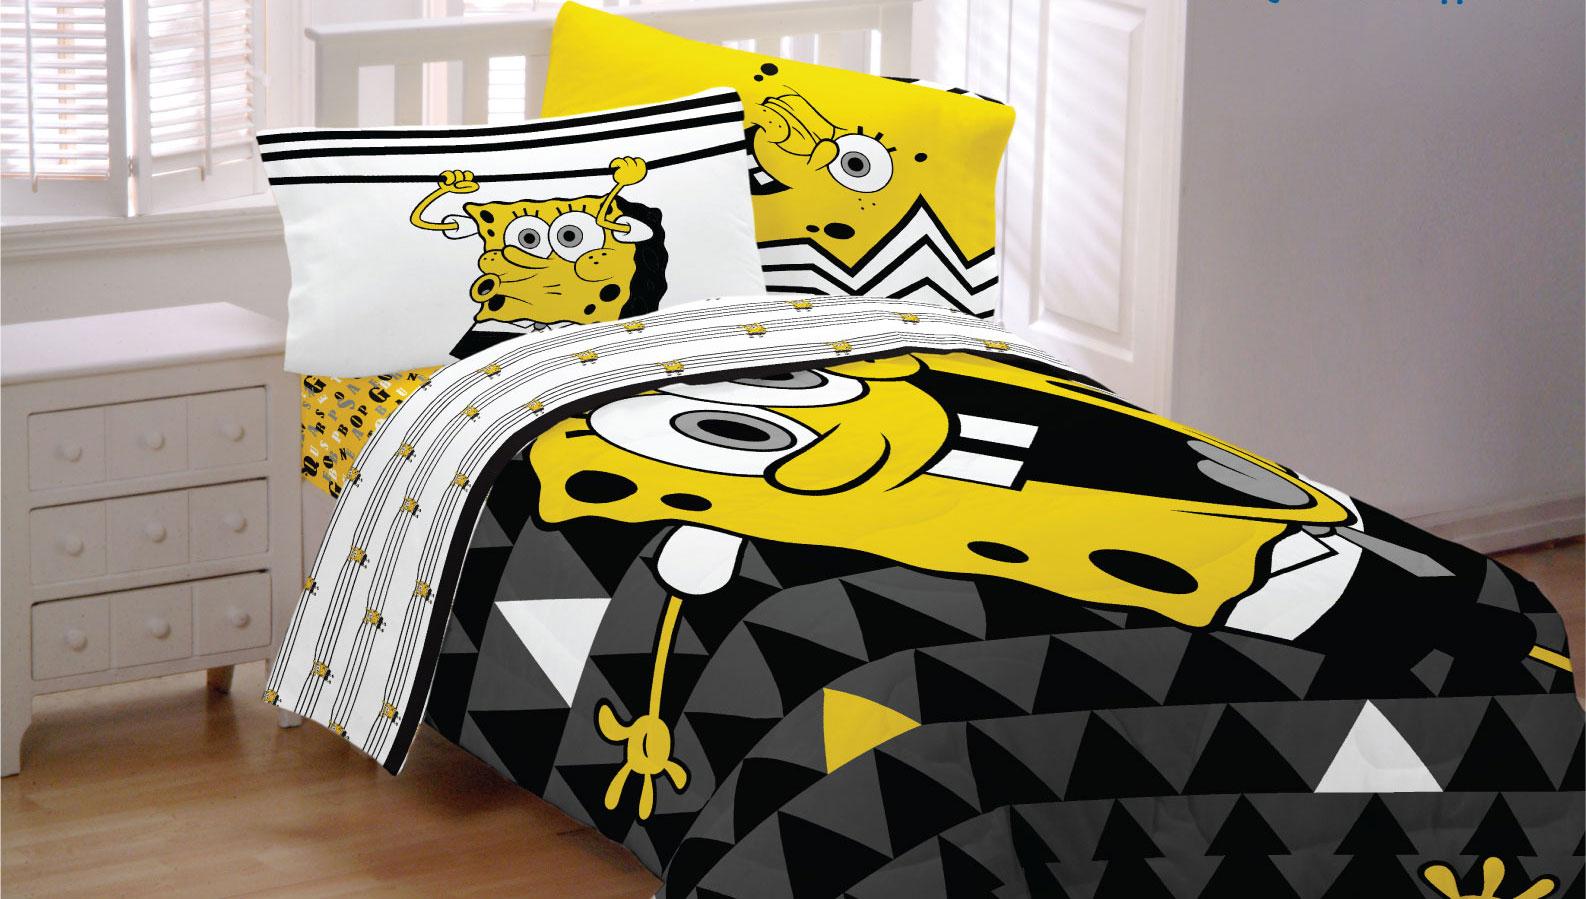 Spongebob Squarepants Bedding Set Try Angle Comforter And Sheet